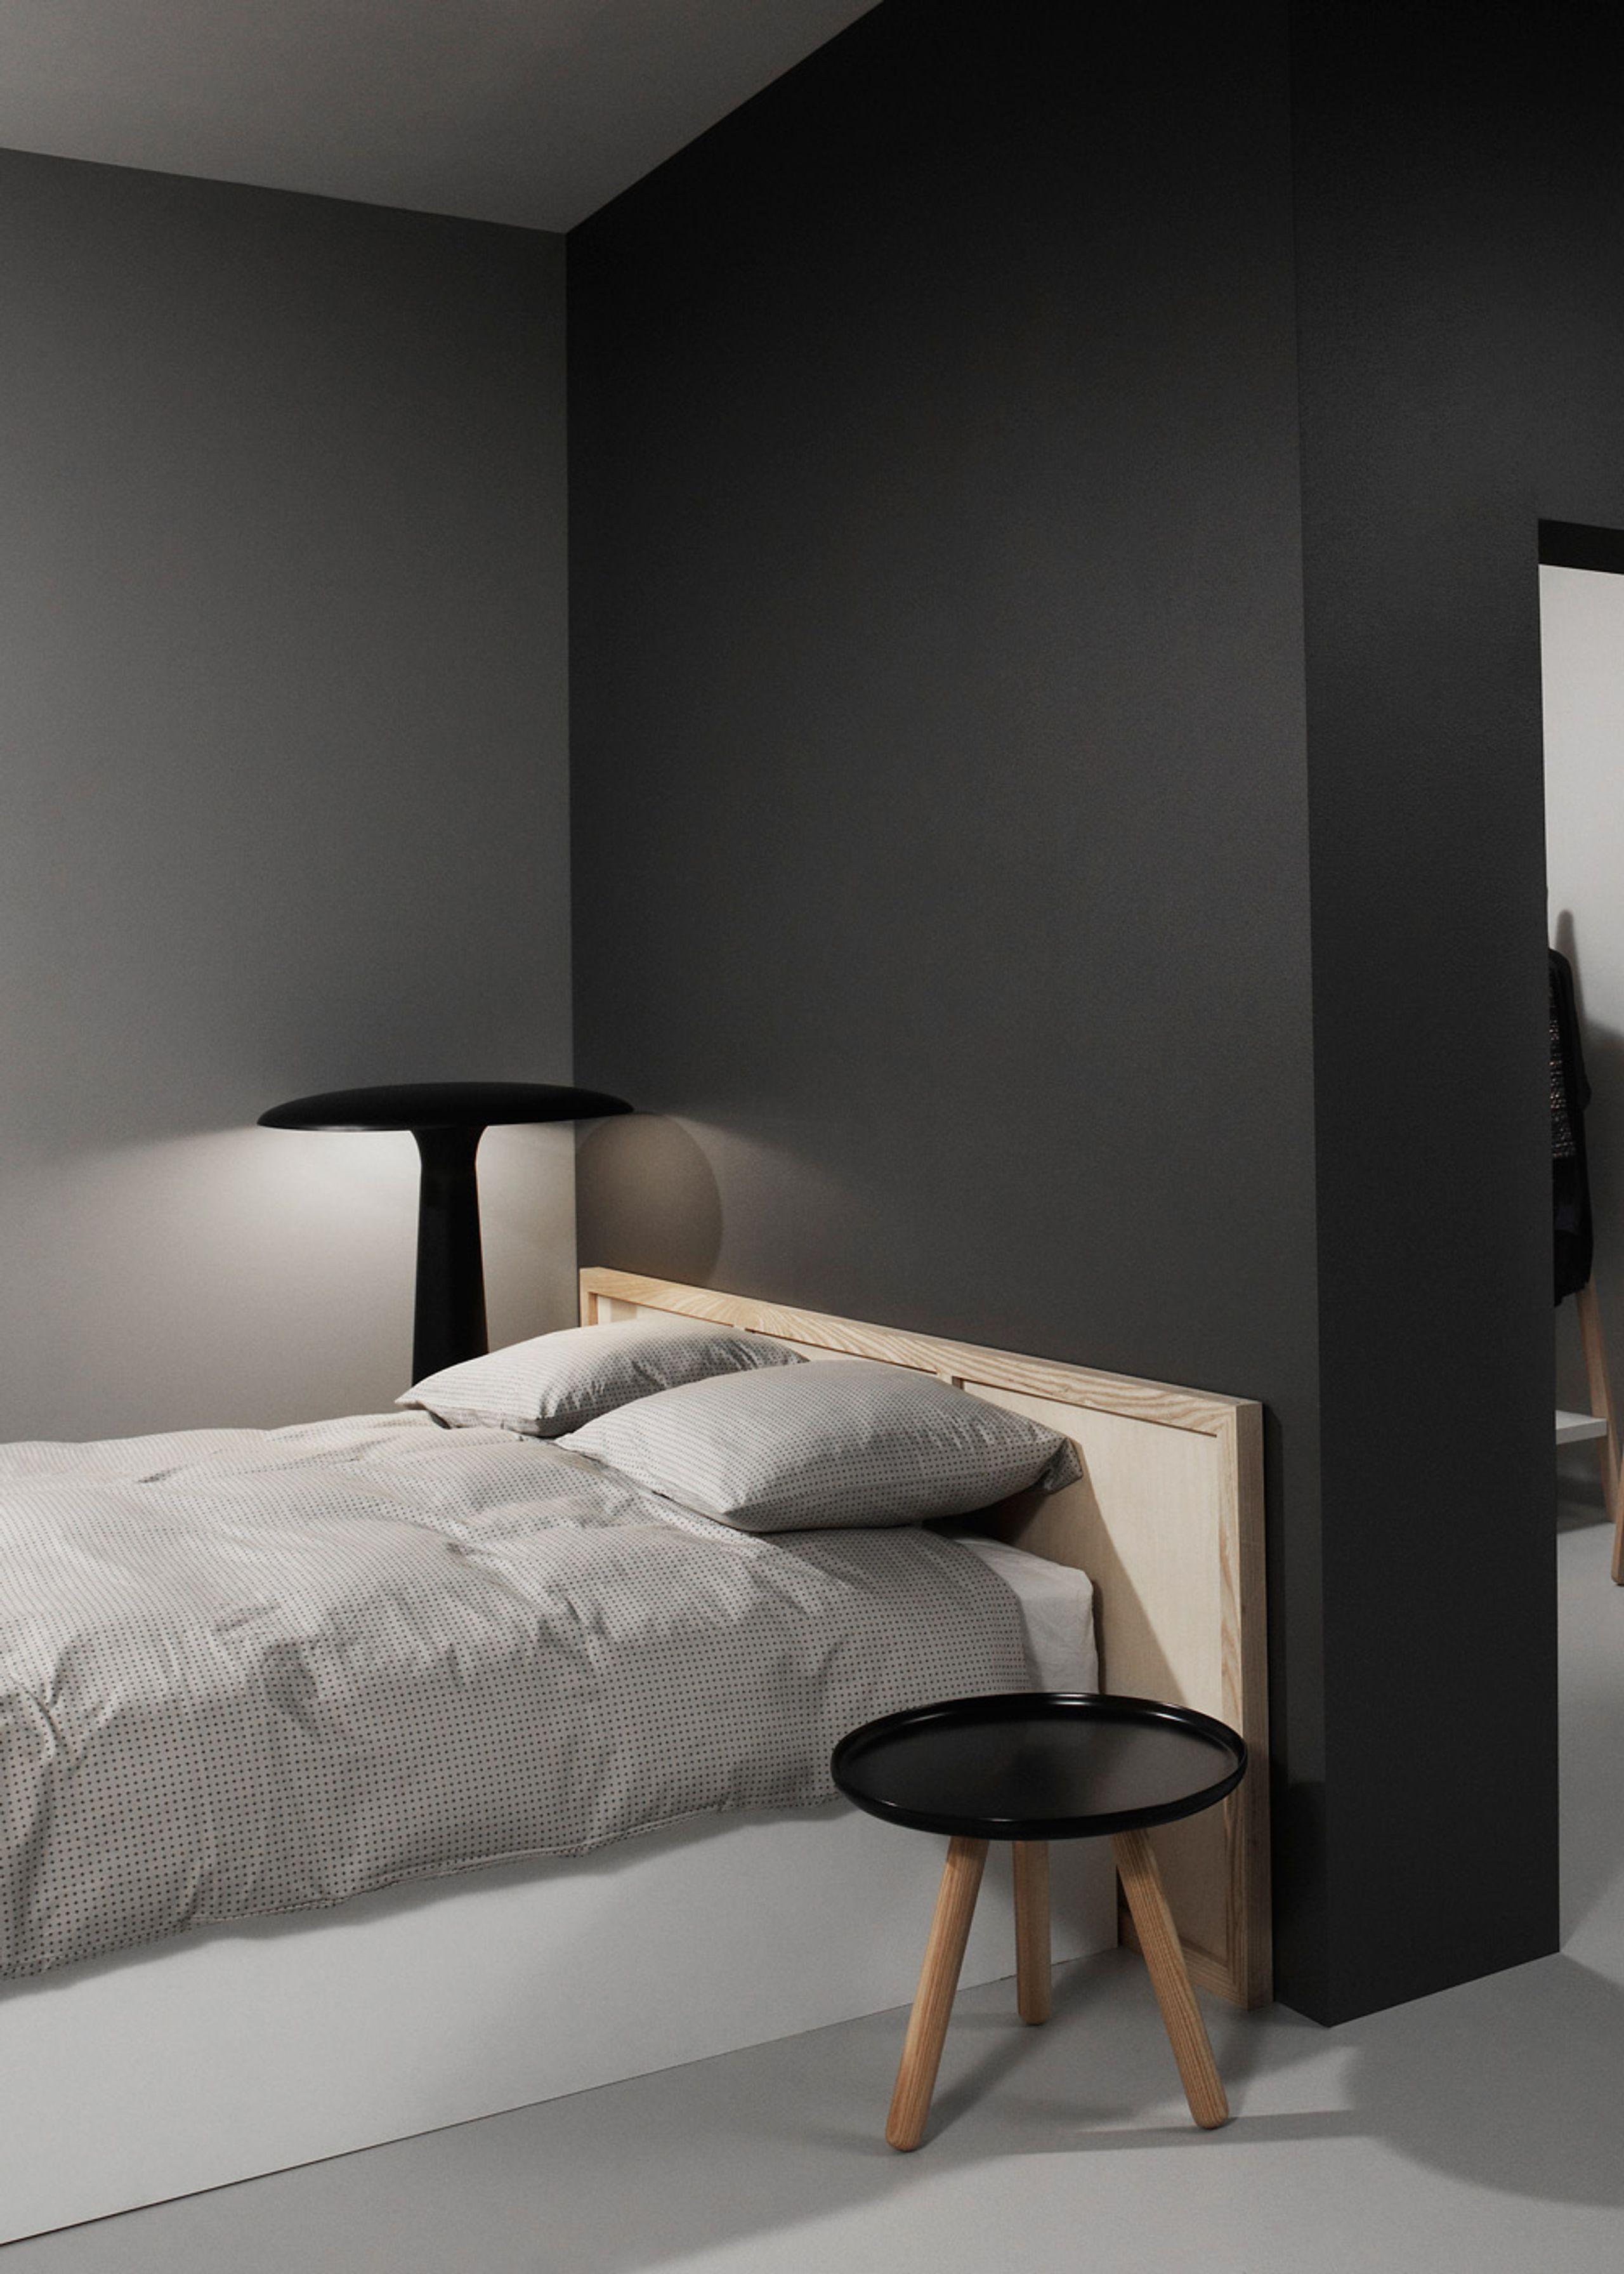 tablo table bord normann copenhagen. Black Bedroom Furniture Sets. Home Design Ideas